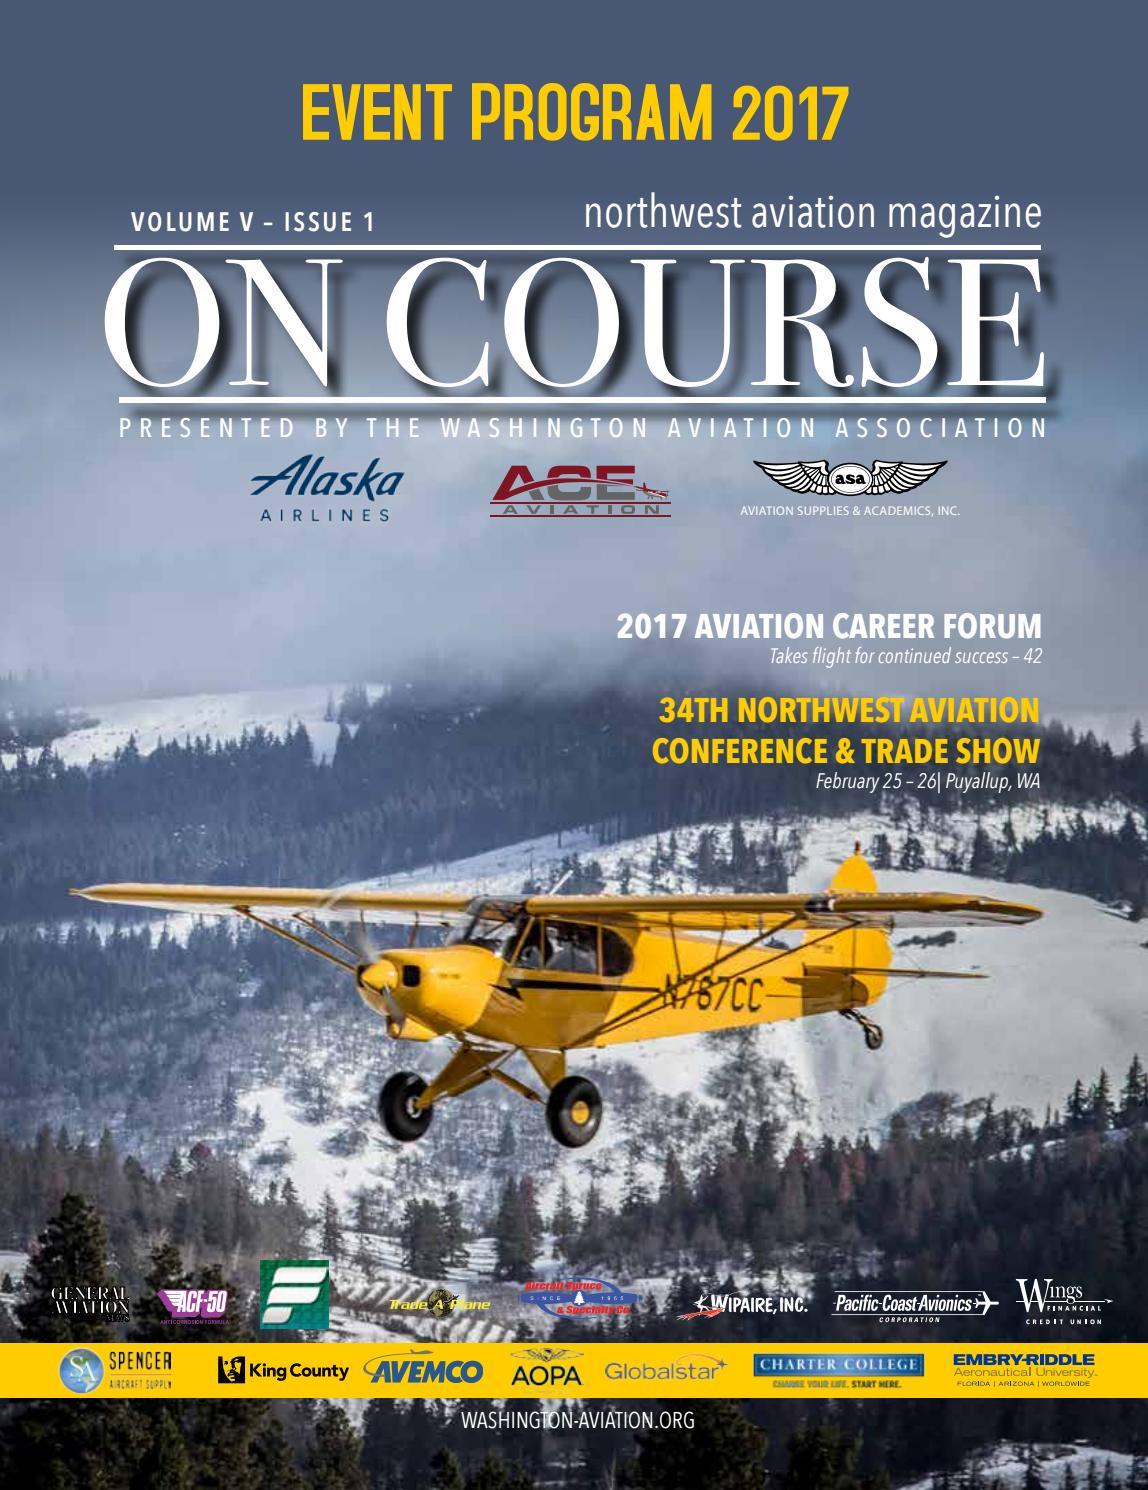 1 Lot of 10 New Auburn Aircraft Spark Plugs FAA-PMA p//n 275